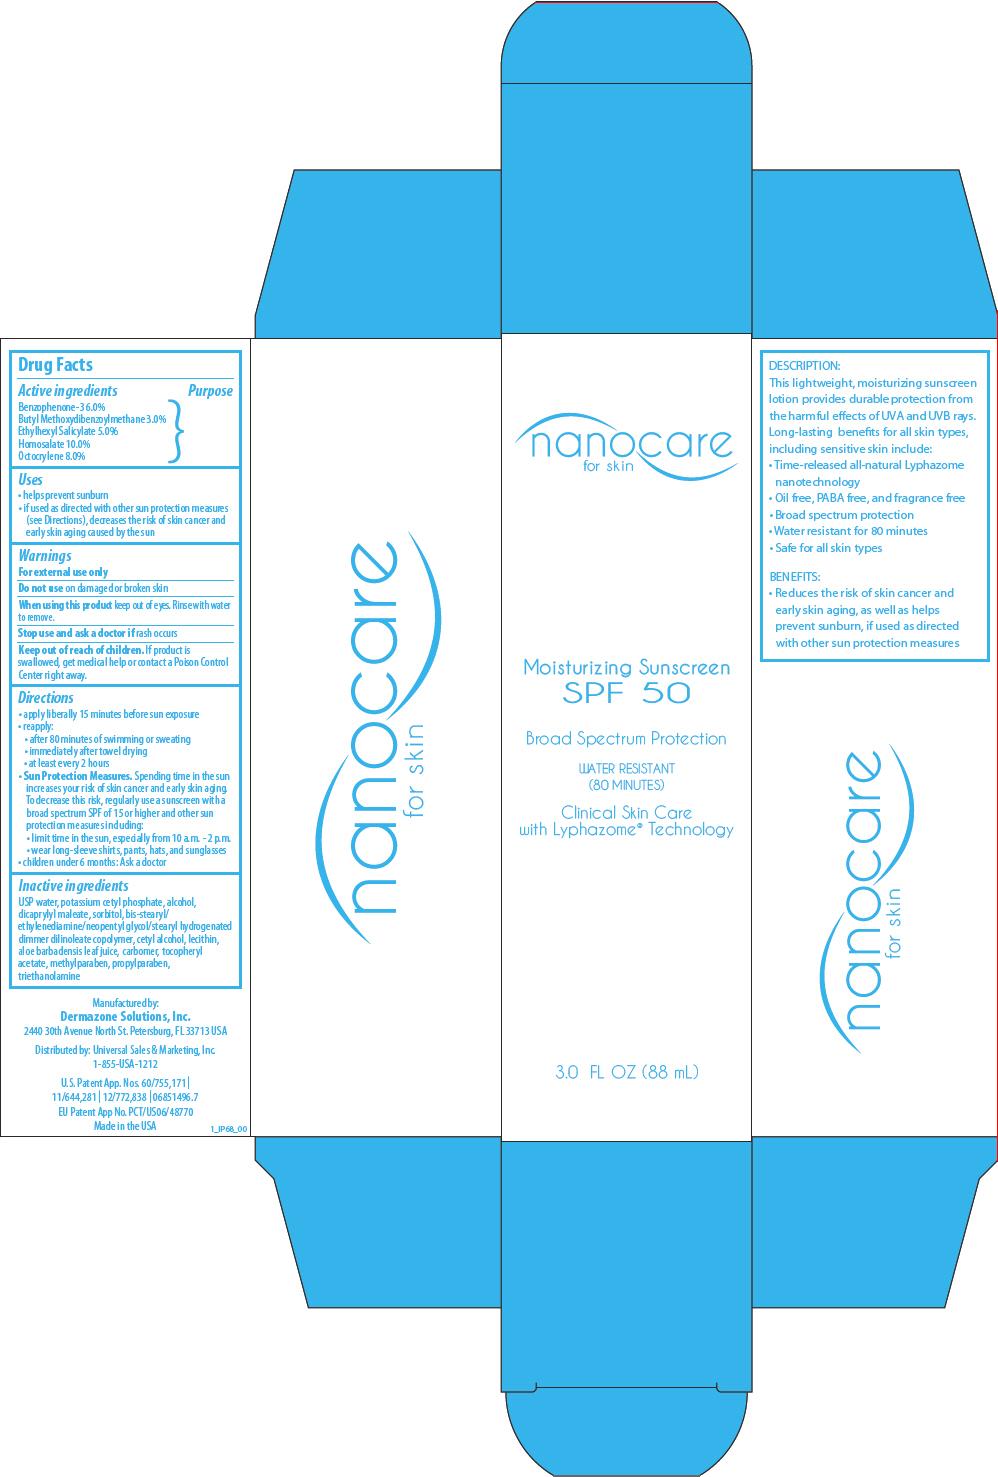 Nanocare Moisturizing Sunscreen Spf 50 (Benzophenone, Avobenzone, Octisalate, Homosalate, And Octocrylene) Lotion [Deramzone Solutions, Inc.]